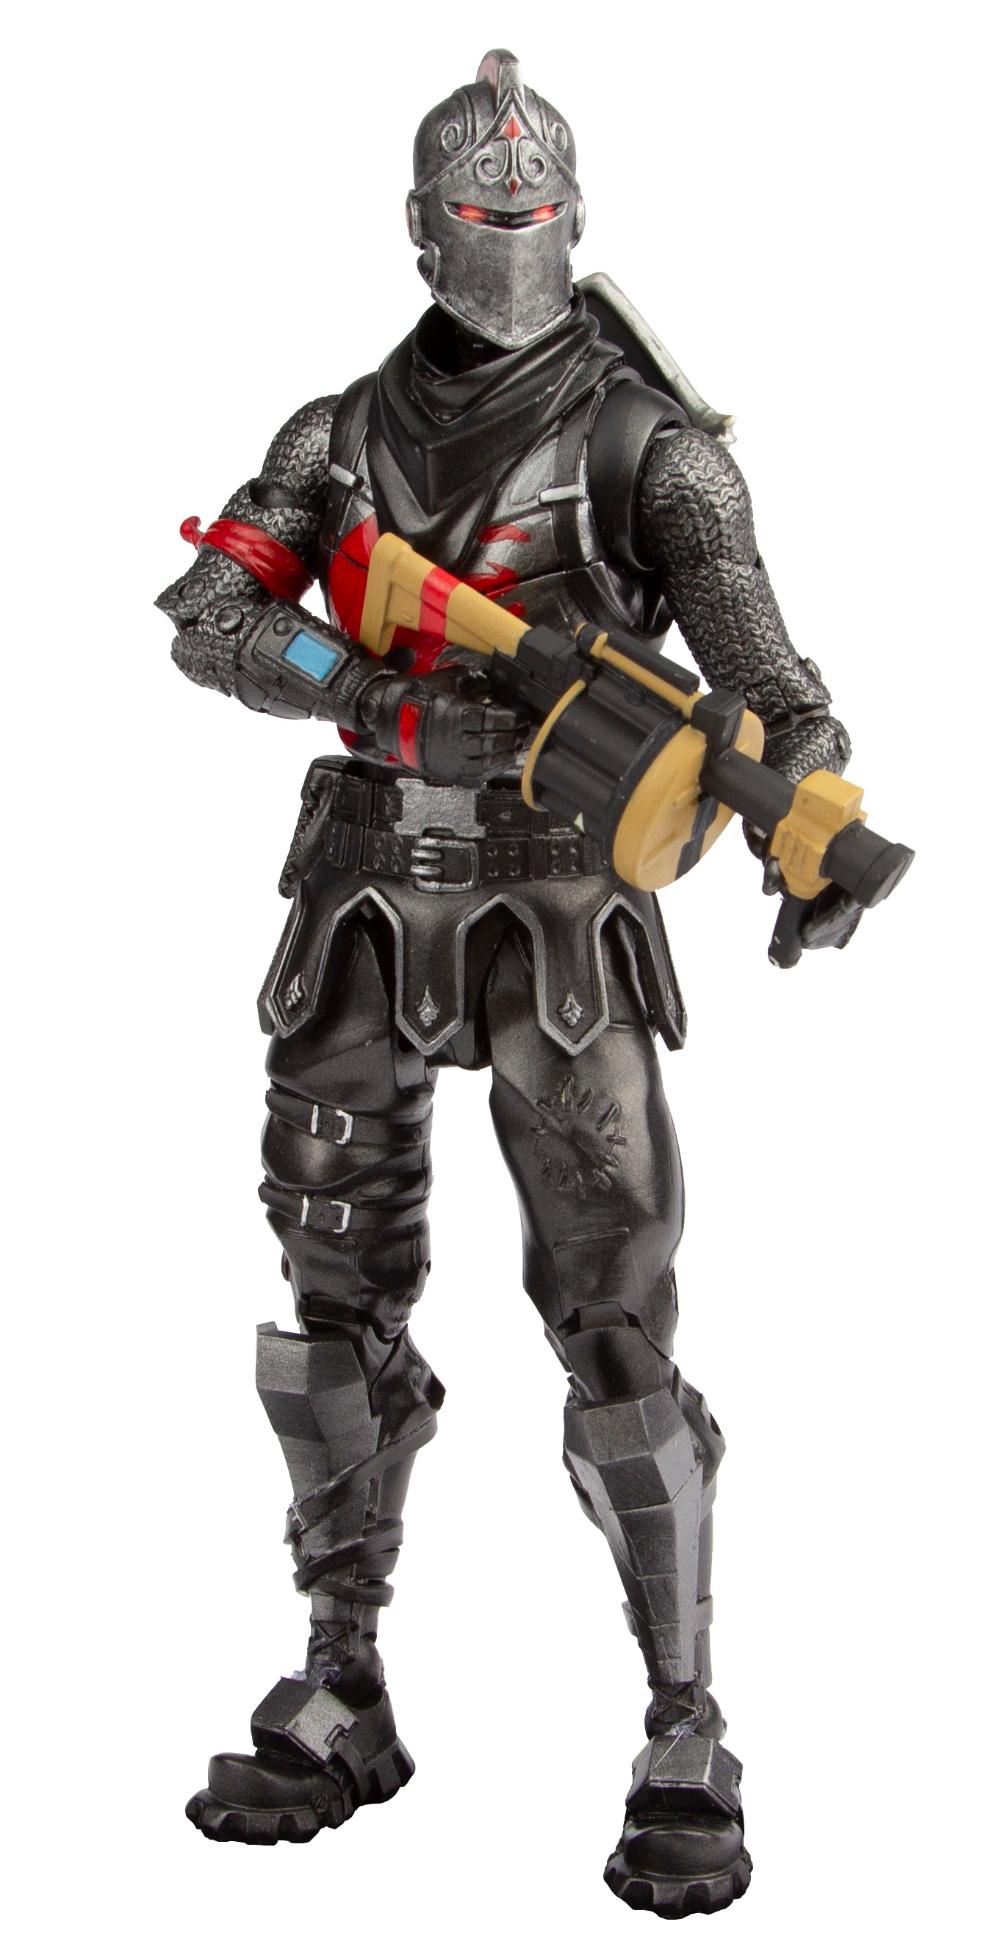 Fortnite Black Knight Walmart Com In 2021 Blackest Knight Knight Action Figures